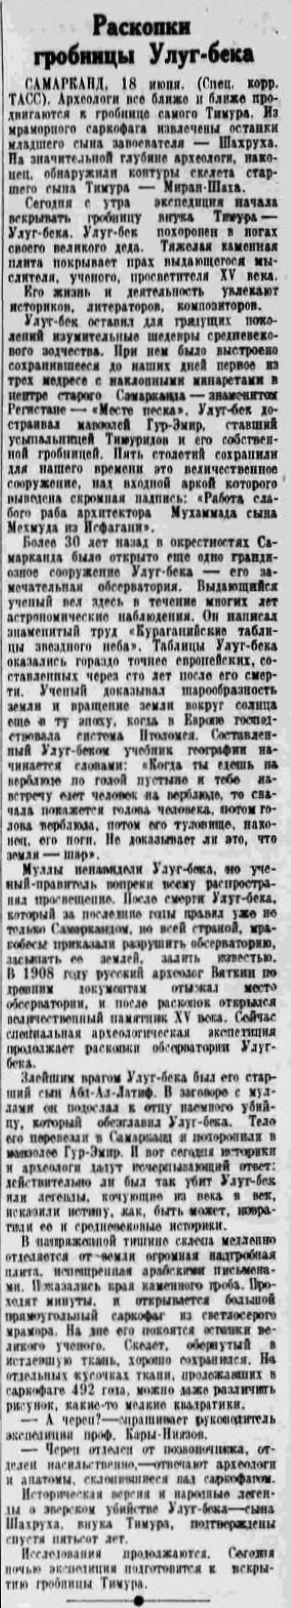 19410619 Pravda Ulugbek